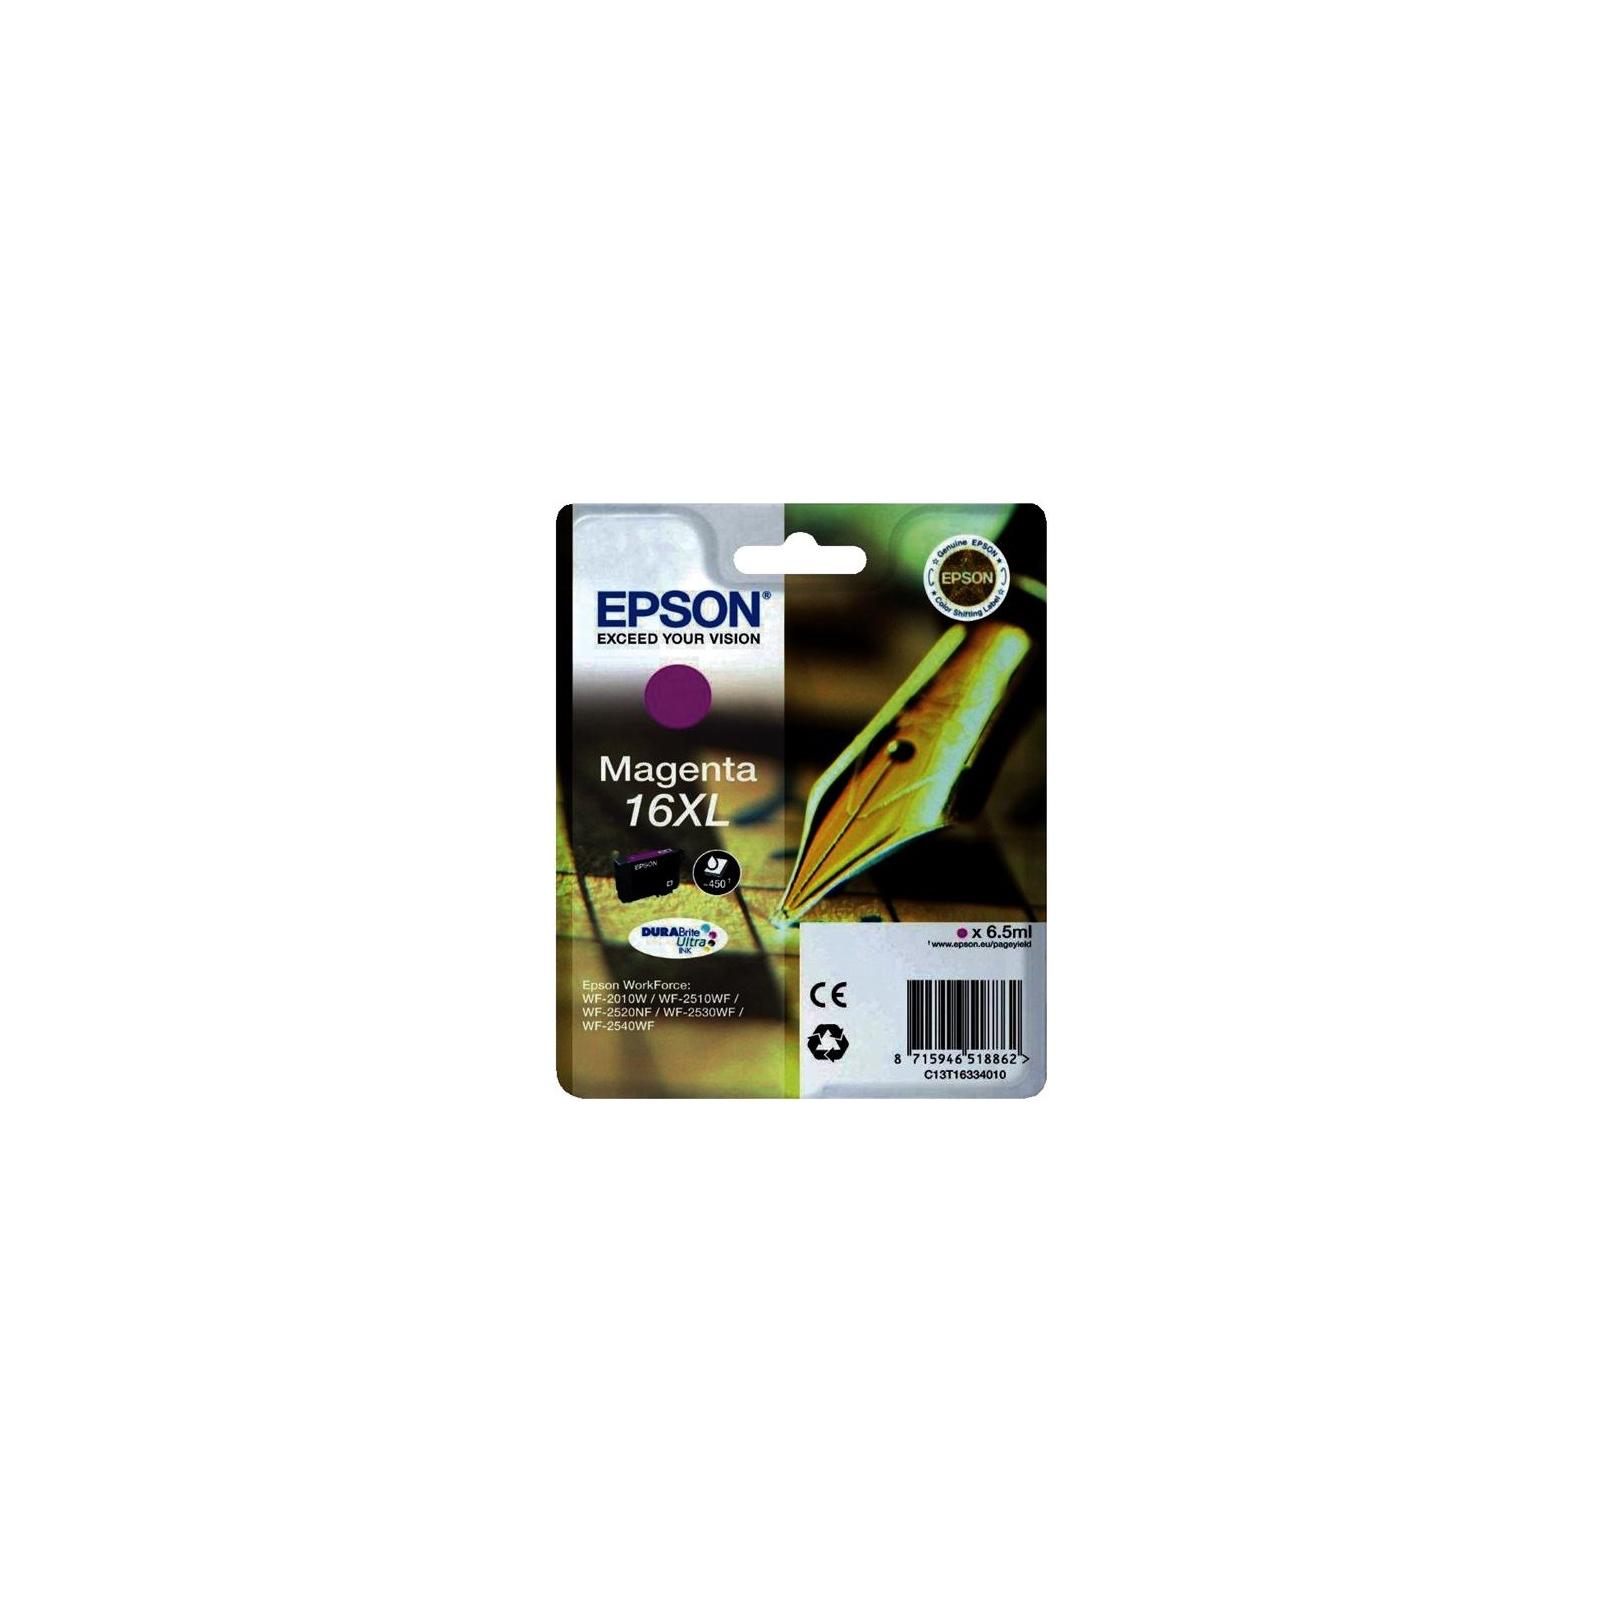 Картридж EPSON 16XL WF-2010 magenta (C13T16334010)